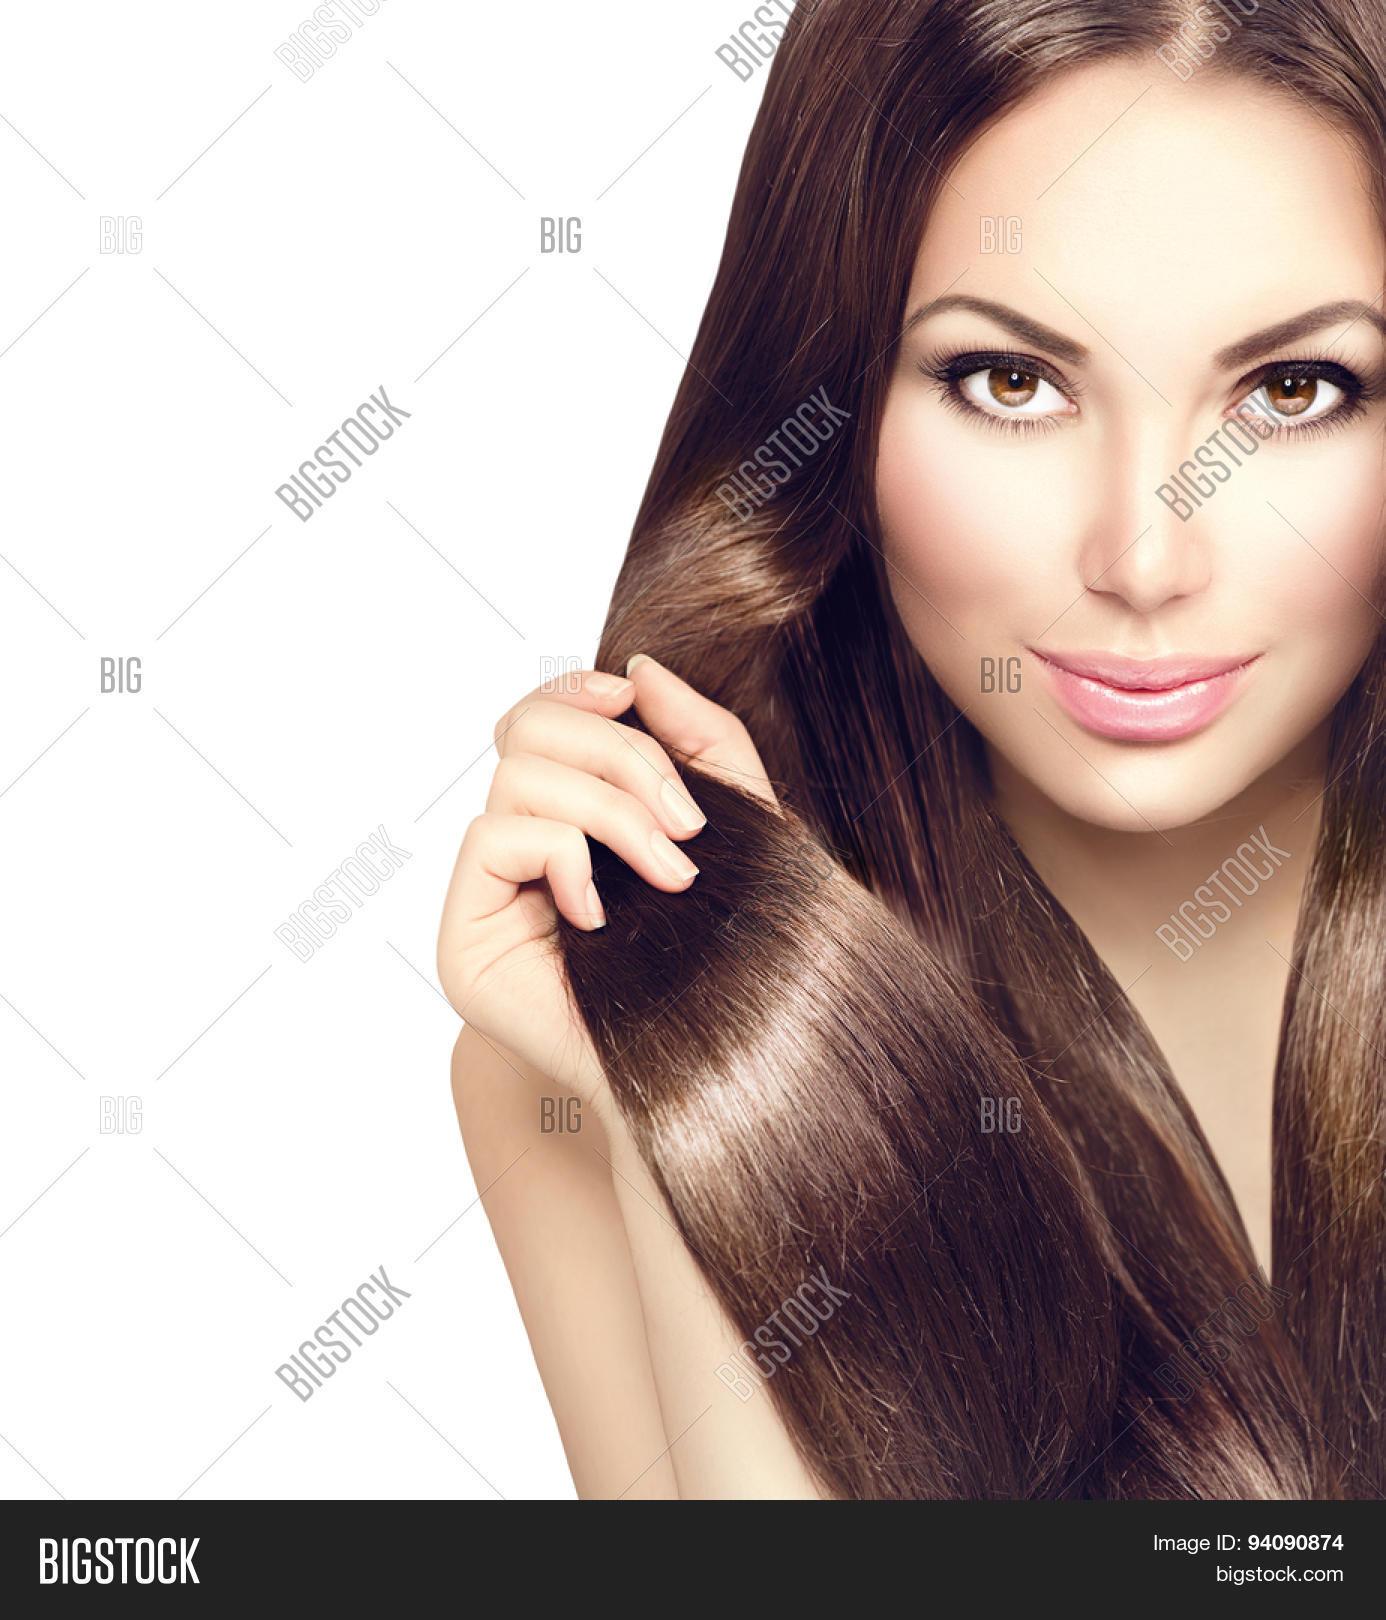 Beauty Model Girl Image & Photo (Free Trial) | Bigstock